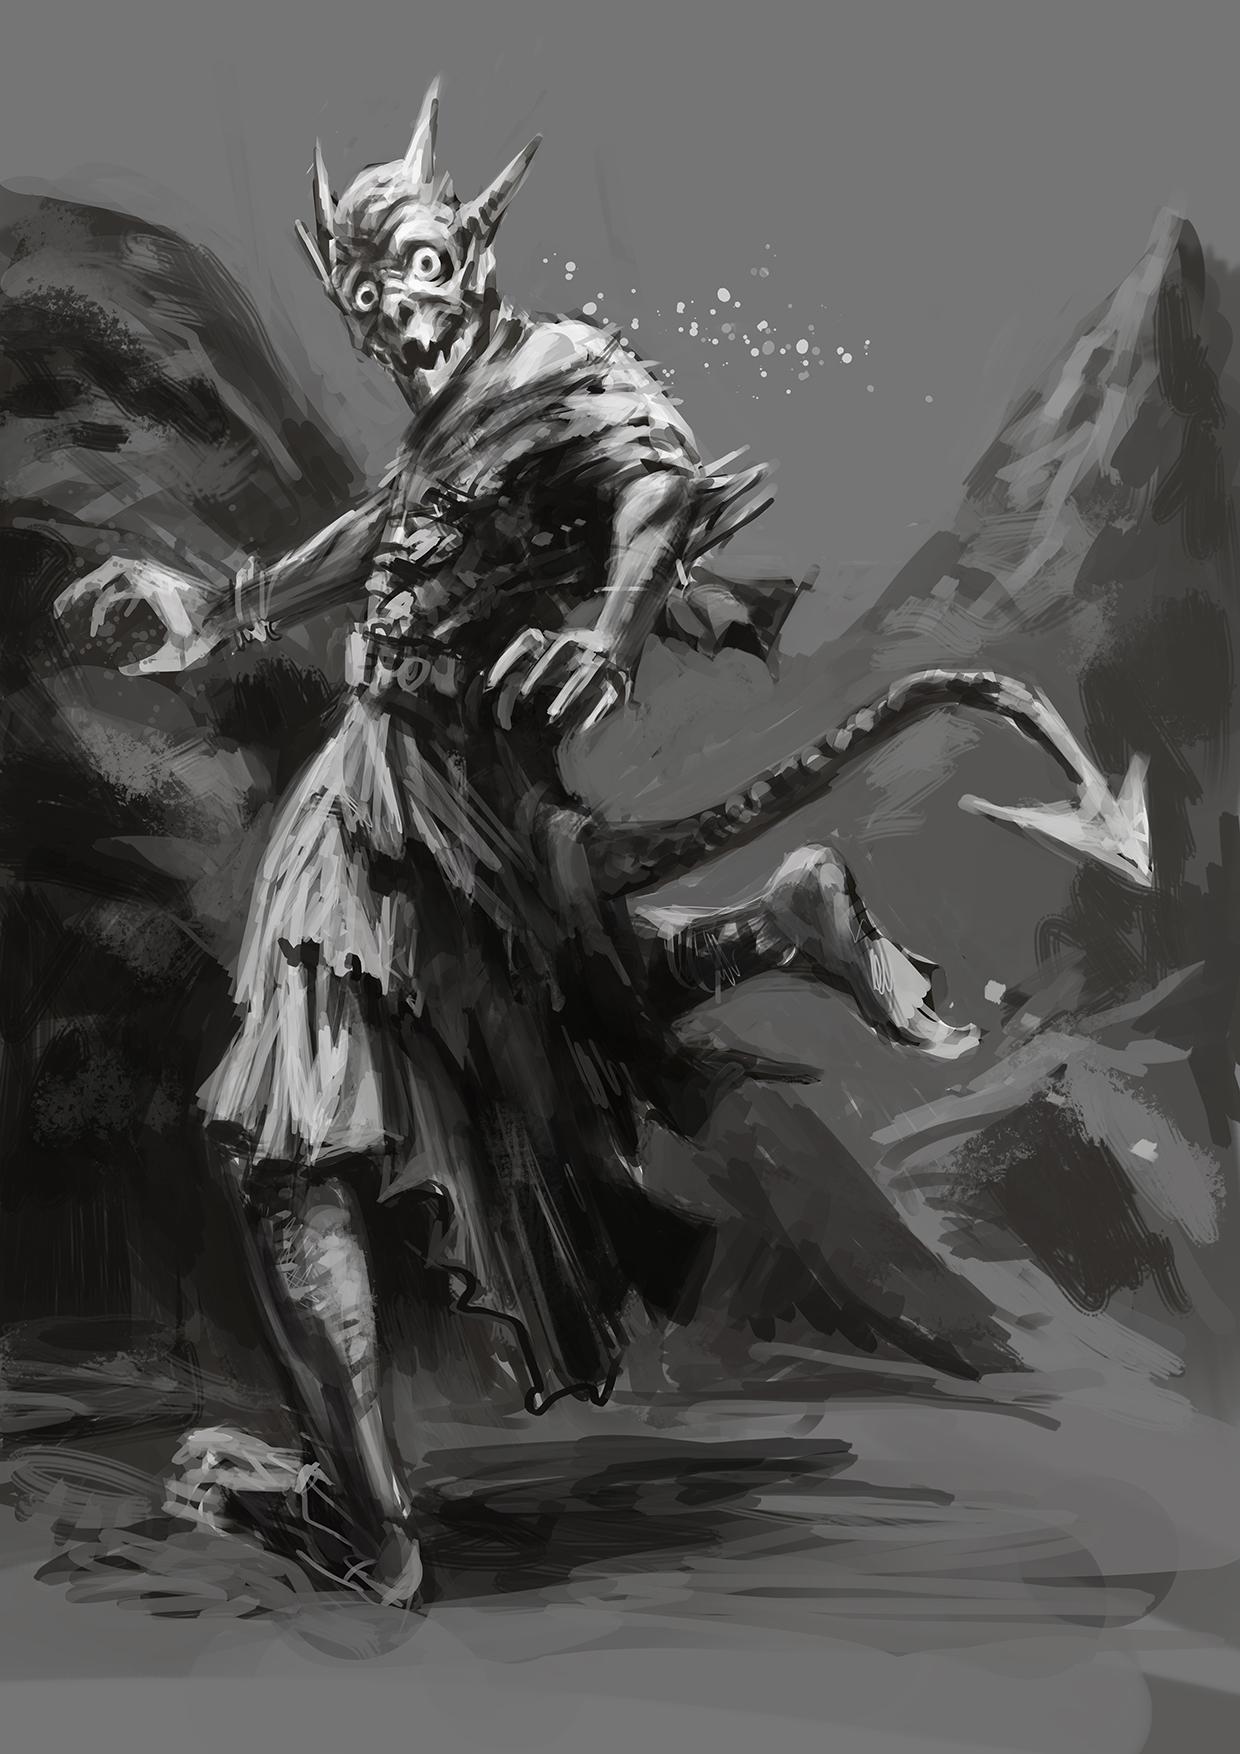 Dragonoid_WIP_001